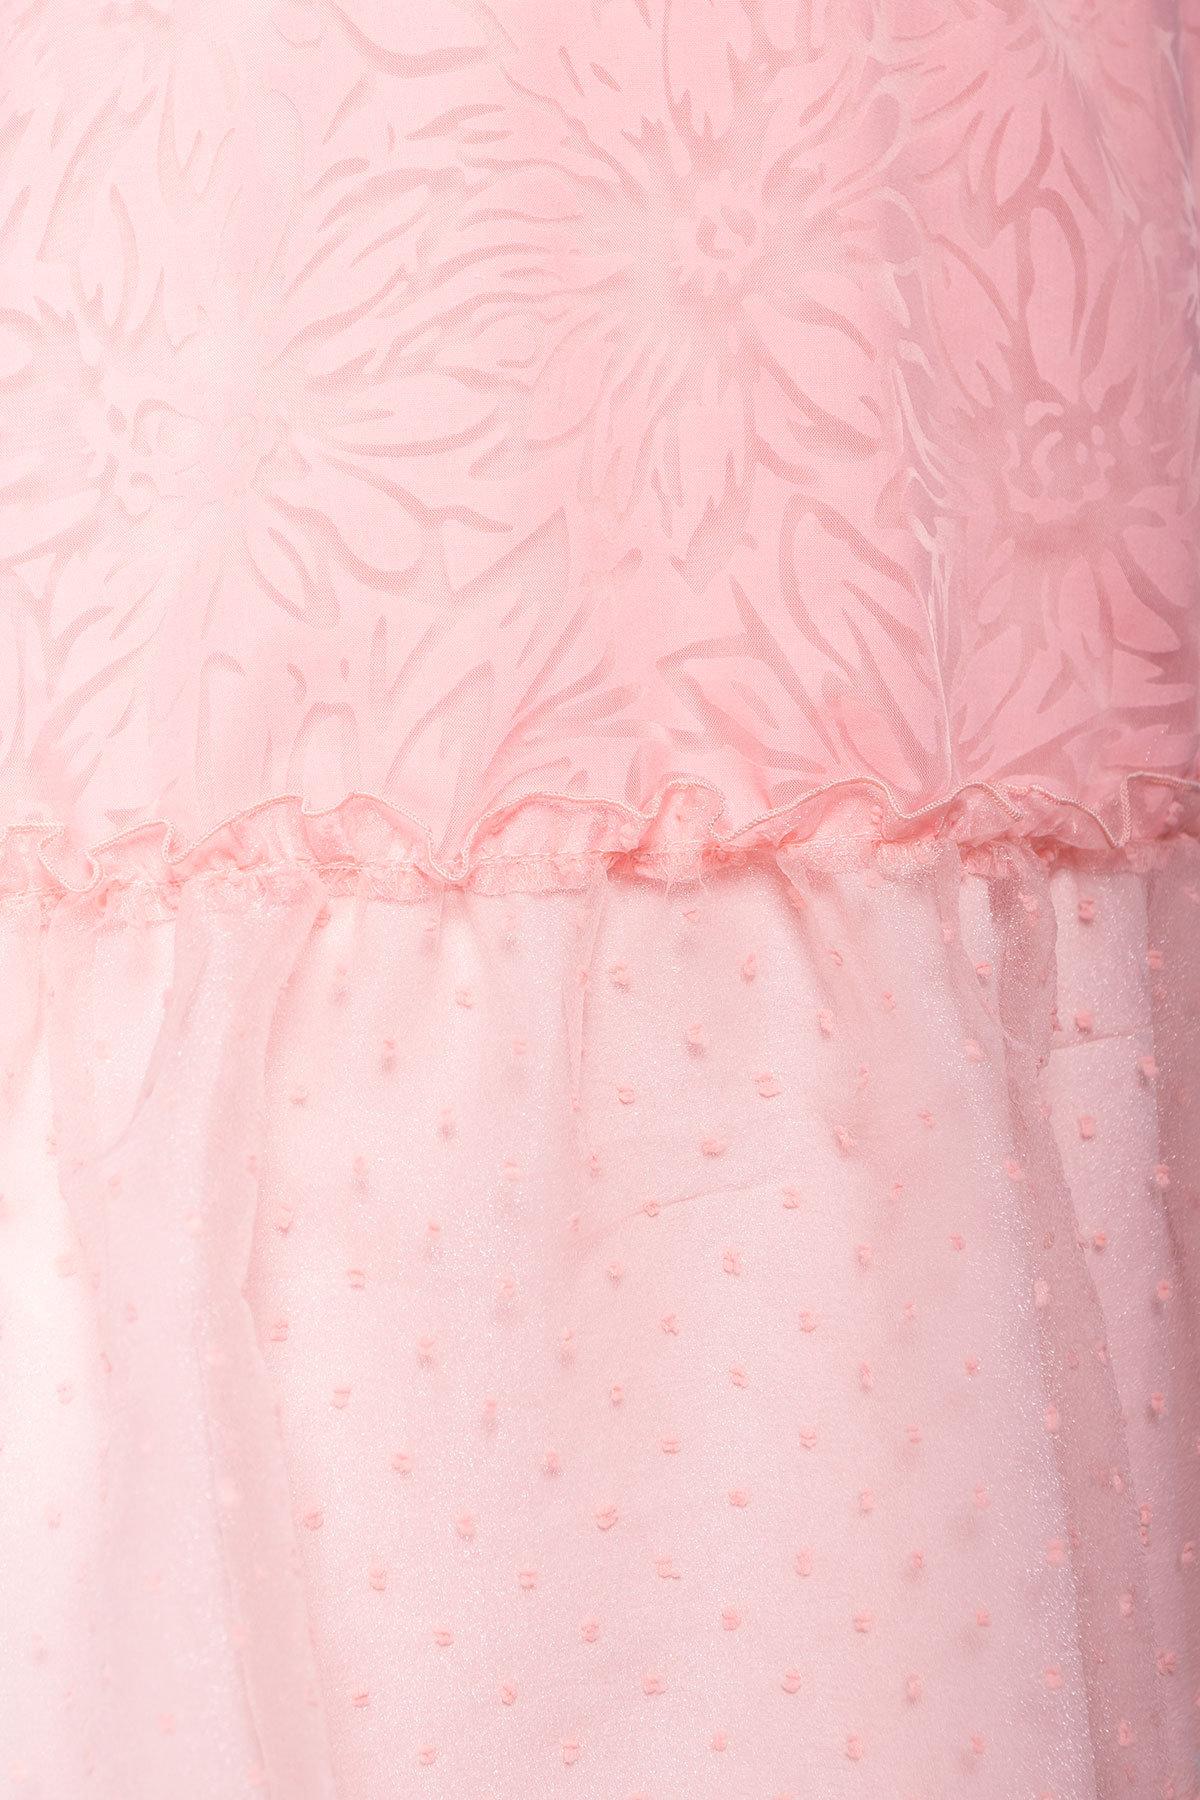 Платье Манила 6978 АРТ. 42368 Цвет: Пудра/мушка/Пудра - фото 4, интернет магазин tm-modus.ru